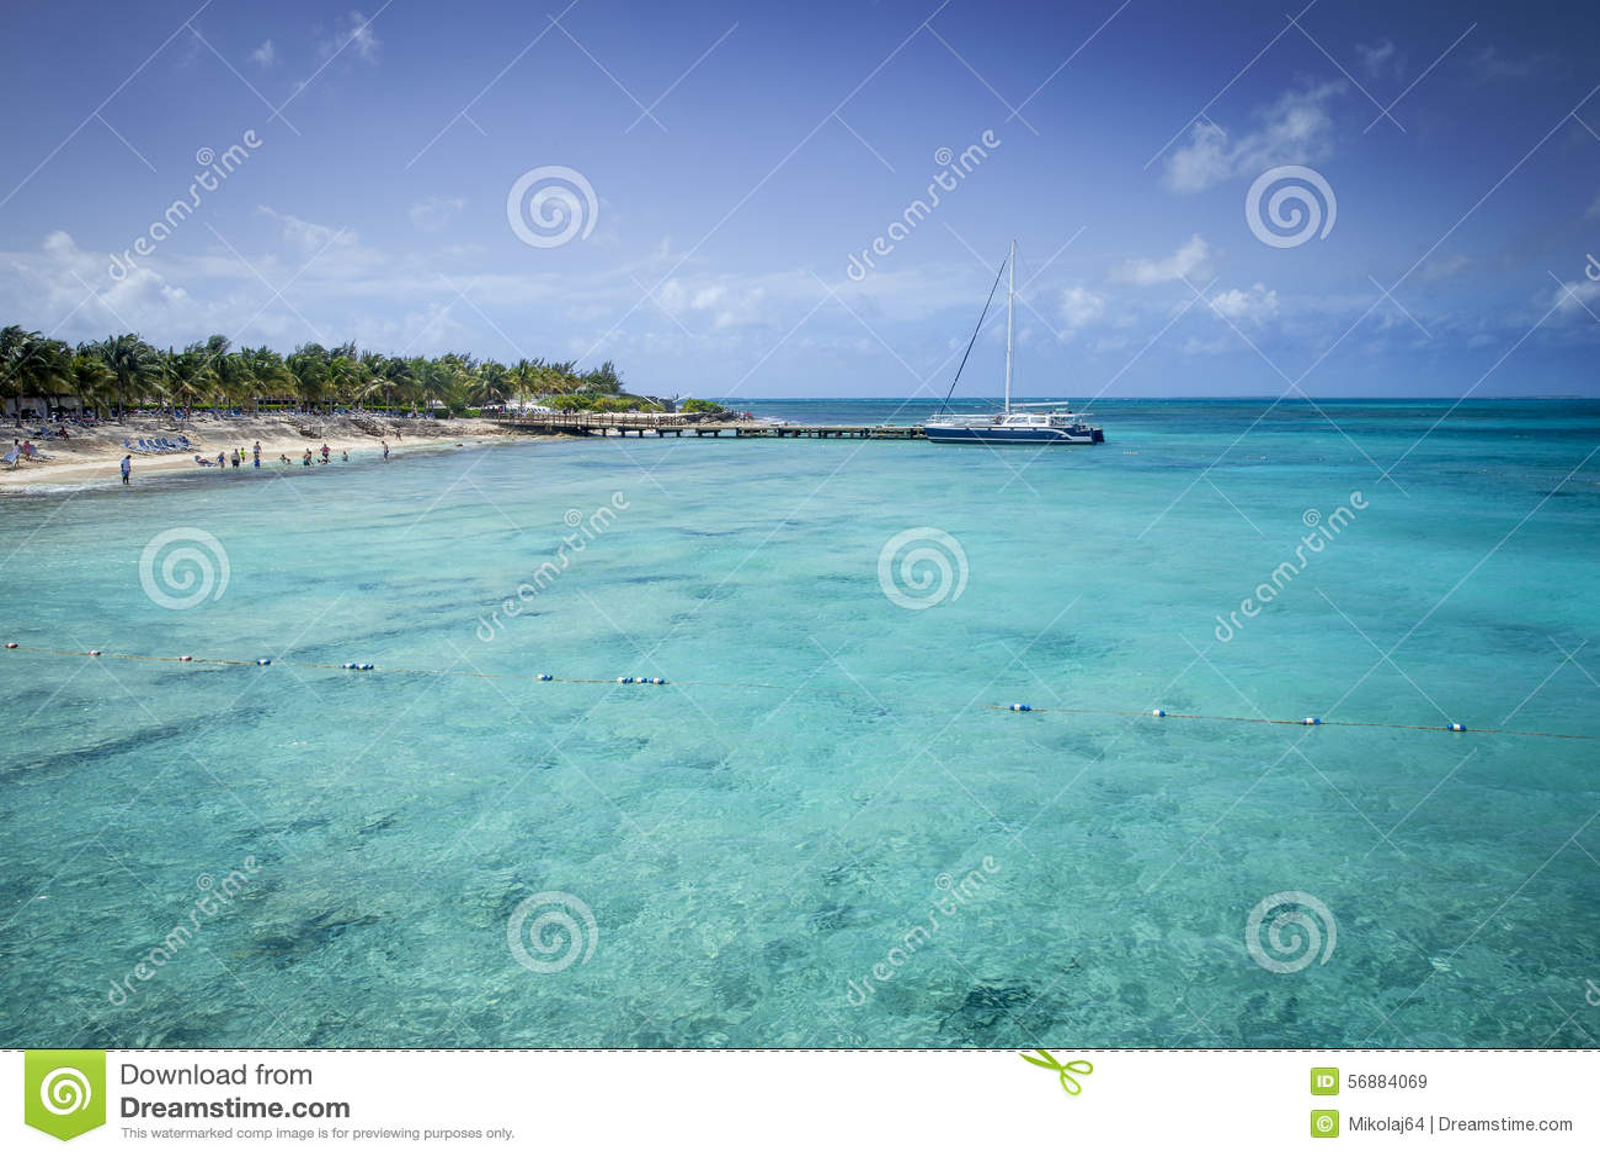 Grande Turk Island, caraibico